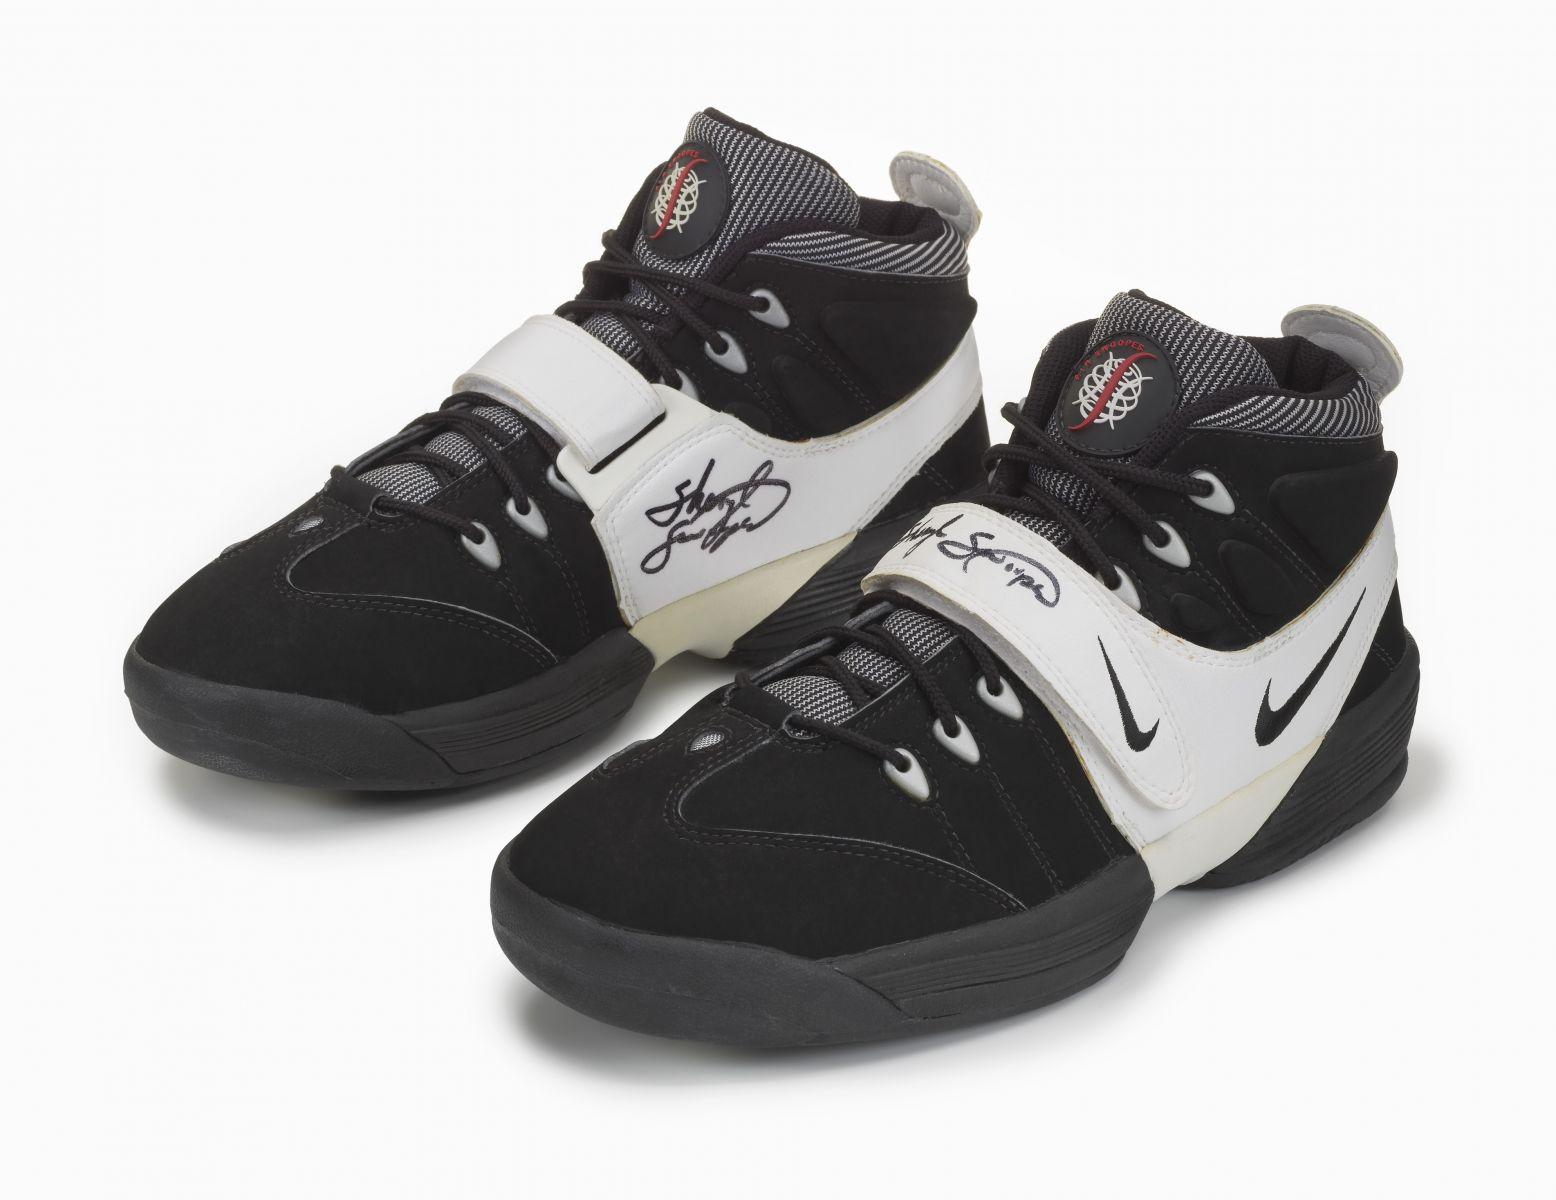 Sheryl Swoopes Nike Signature Sneakers  a31fadb70